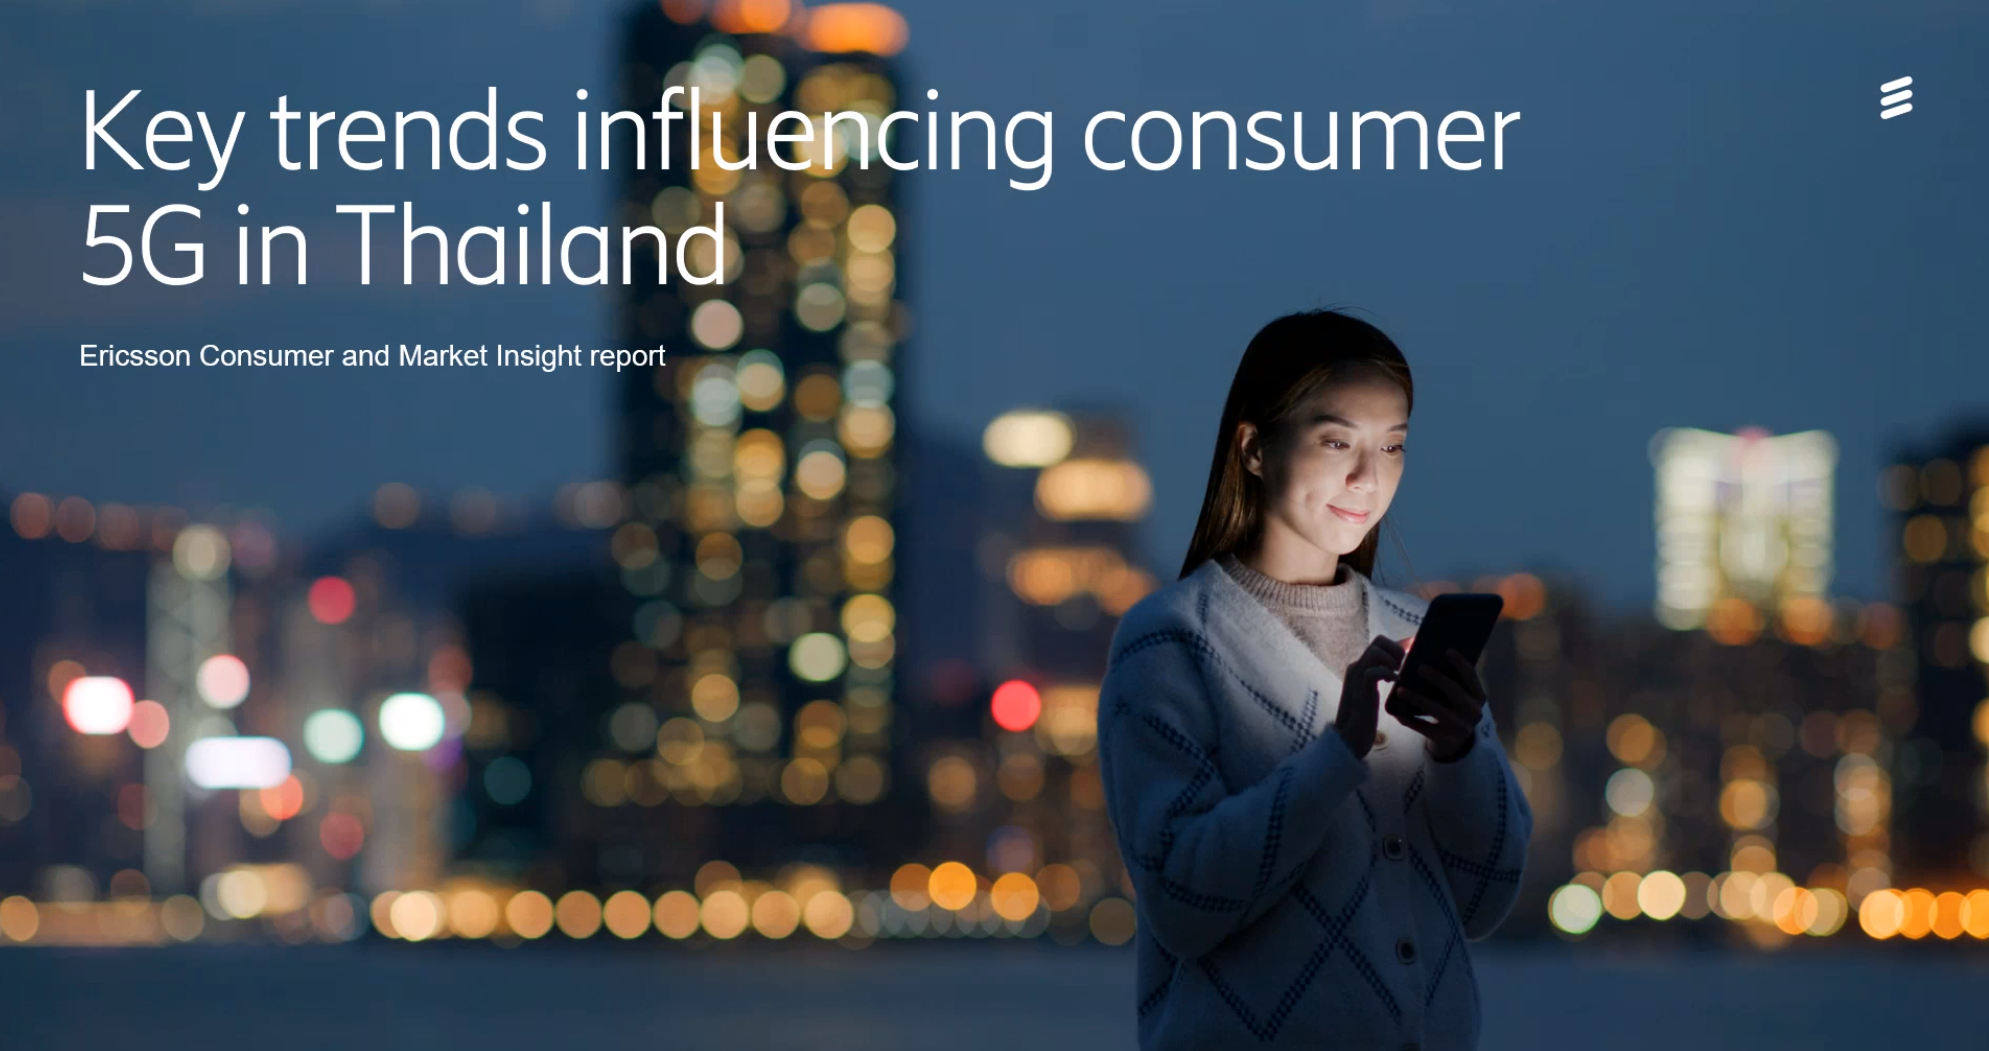 Ericsson ชี้ไทยต้องเร่งดำเนินการ 5G SA ด่วนที่สุด เพื่อรองรับลูกค้า 5 ล้านราย พร้อมเพิ่ม 86 LIVE 5G network เหตุความเร็วเป็นจุดชี้ขาดทางธุรกิจ